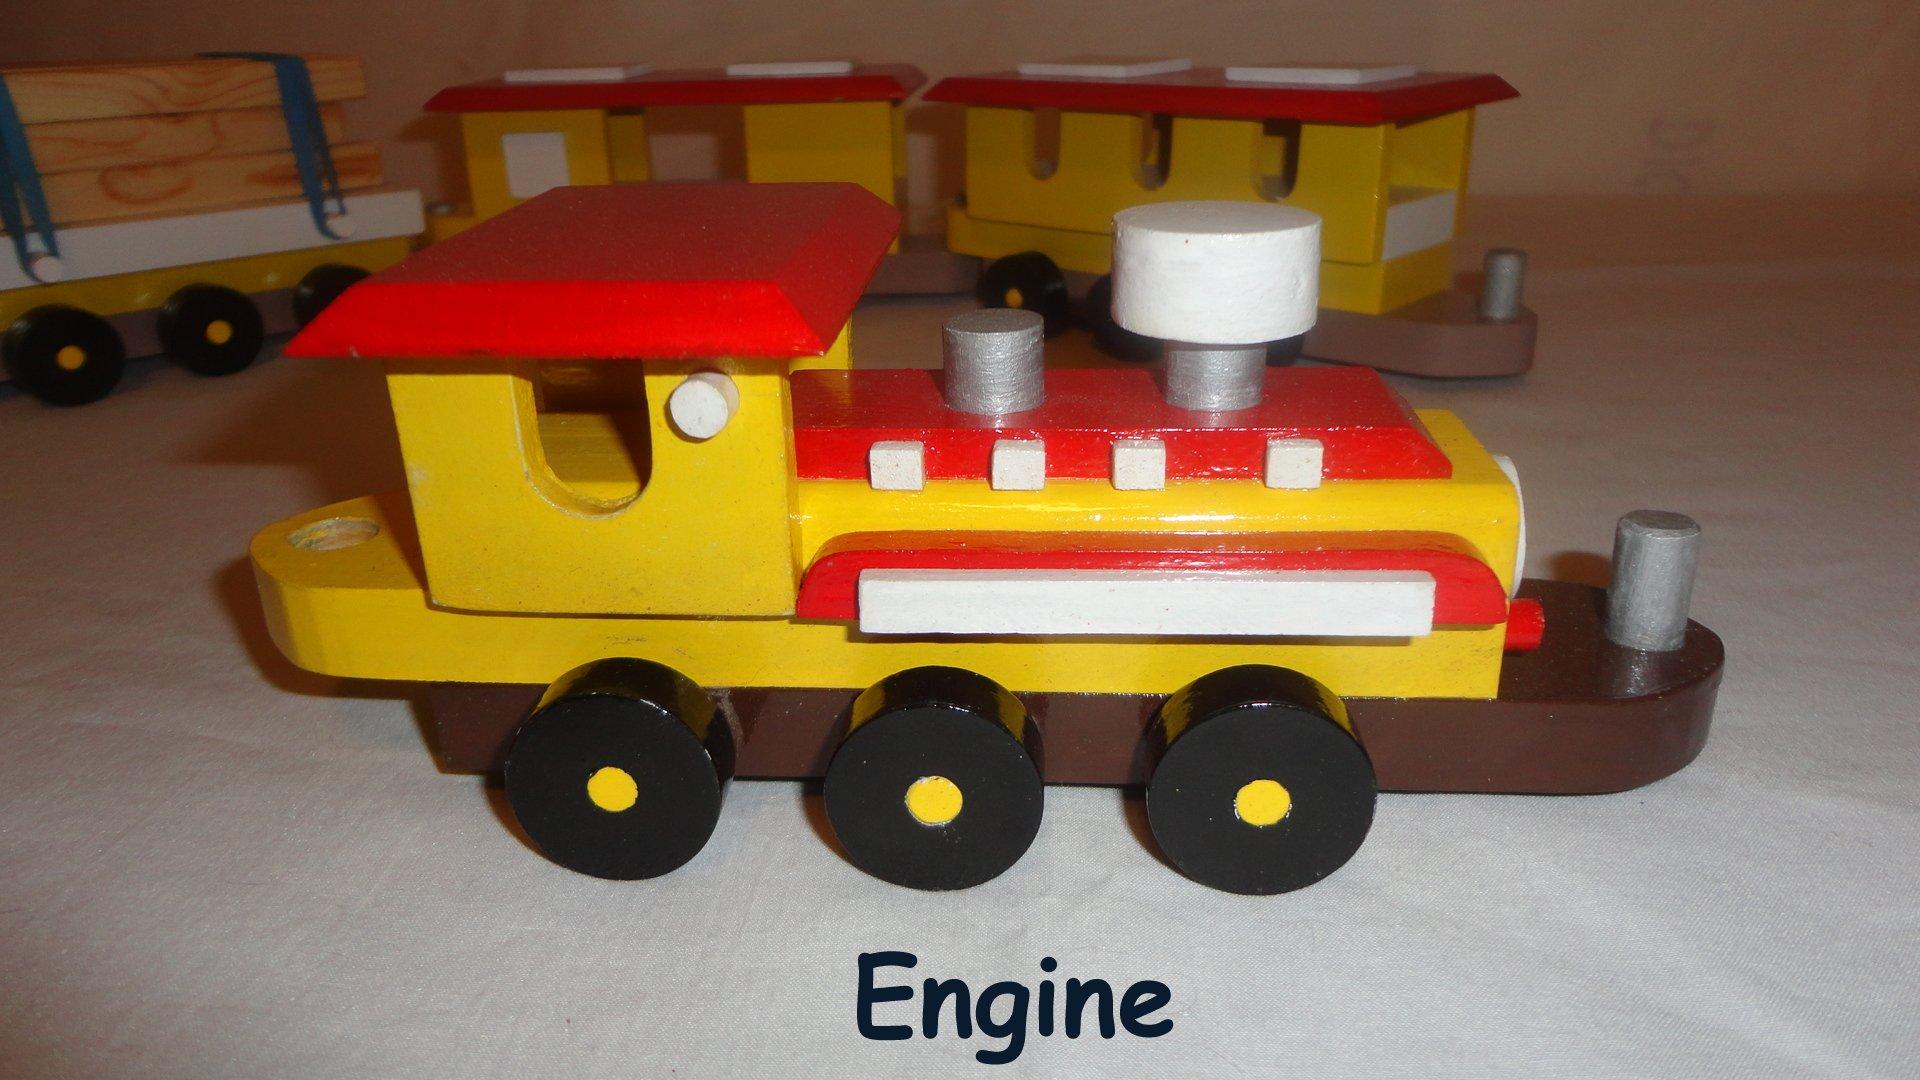 Engine-a.jpg